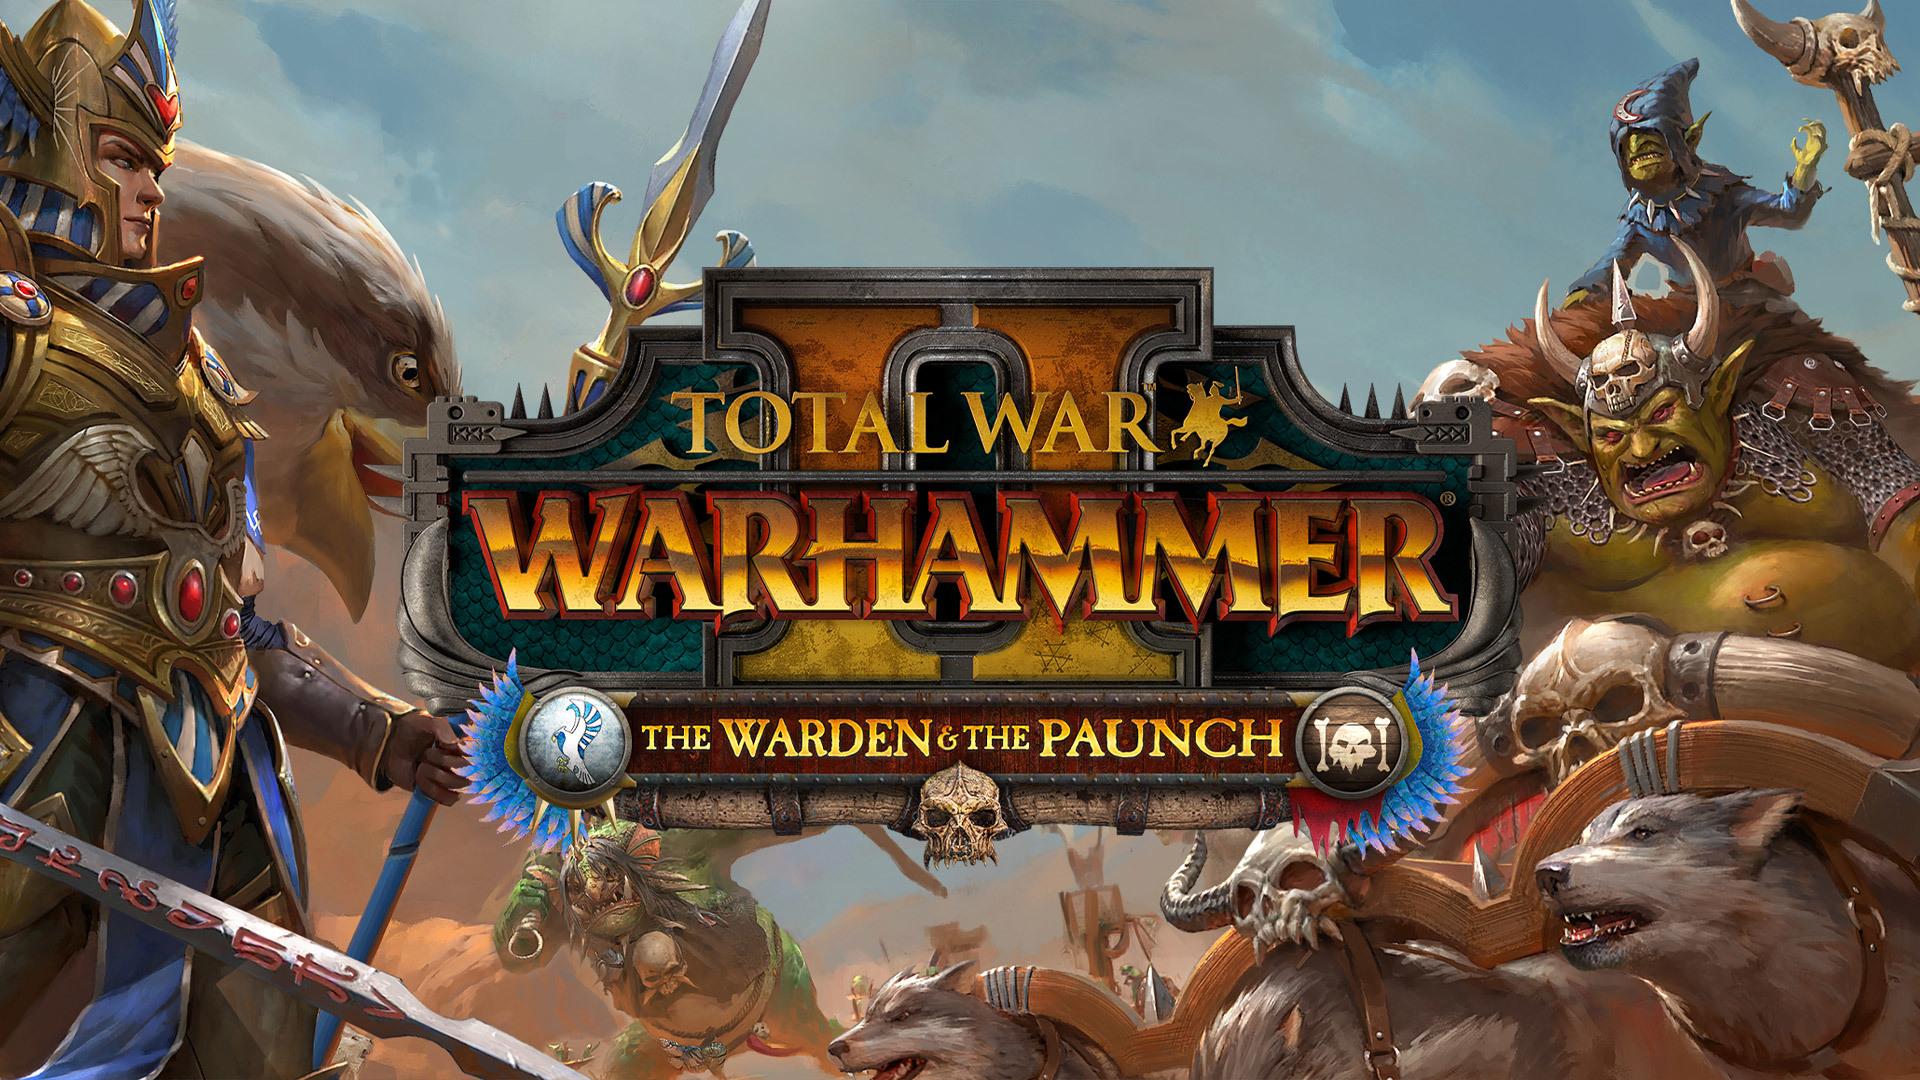 Total War: WARHAMMER II +The Twisted & The Twilight + ВСЕ DLC со скидкой, офлайн, активация, denuvo [Ручная активация Steam]